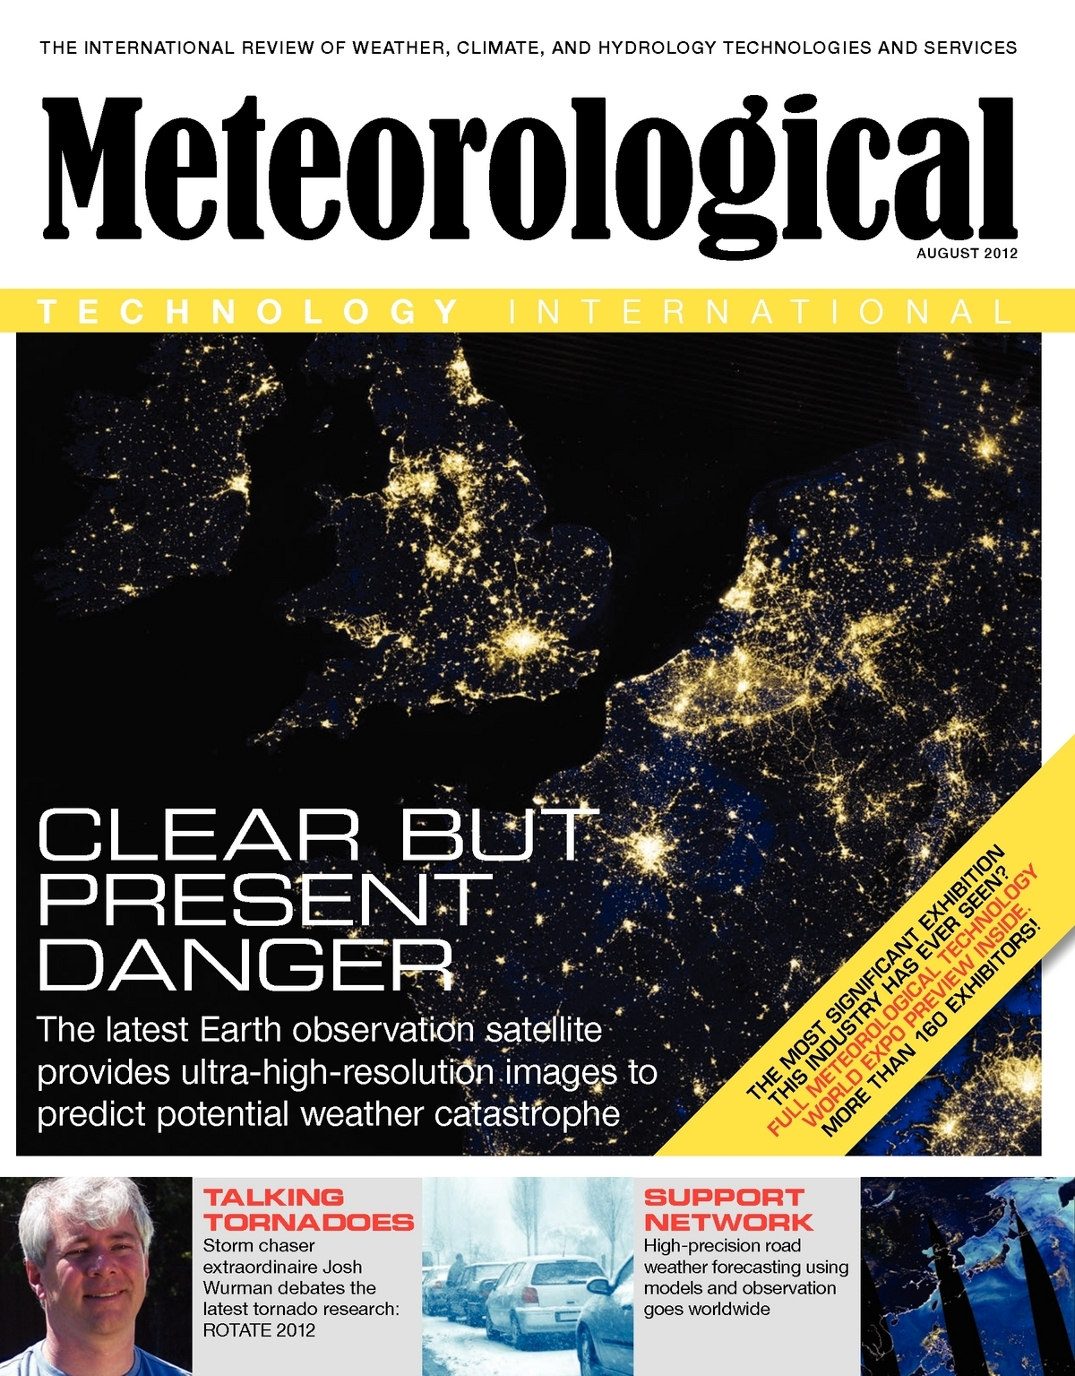 Meteorological Technology International - August 2012